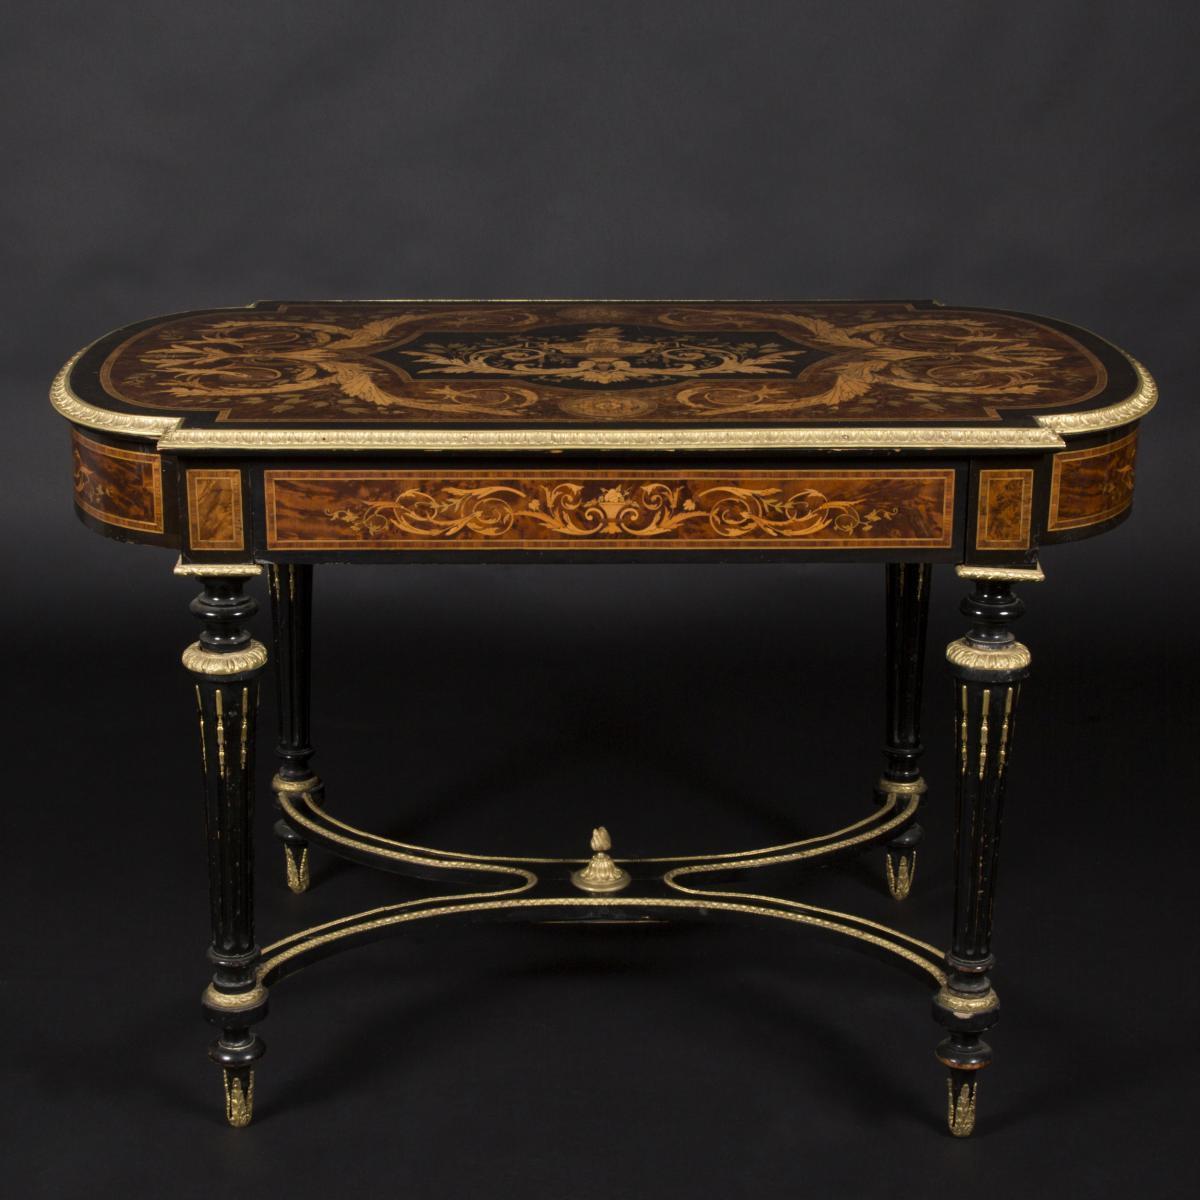 Table de milieu, XIXe